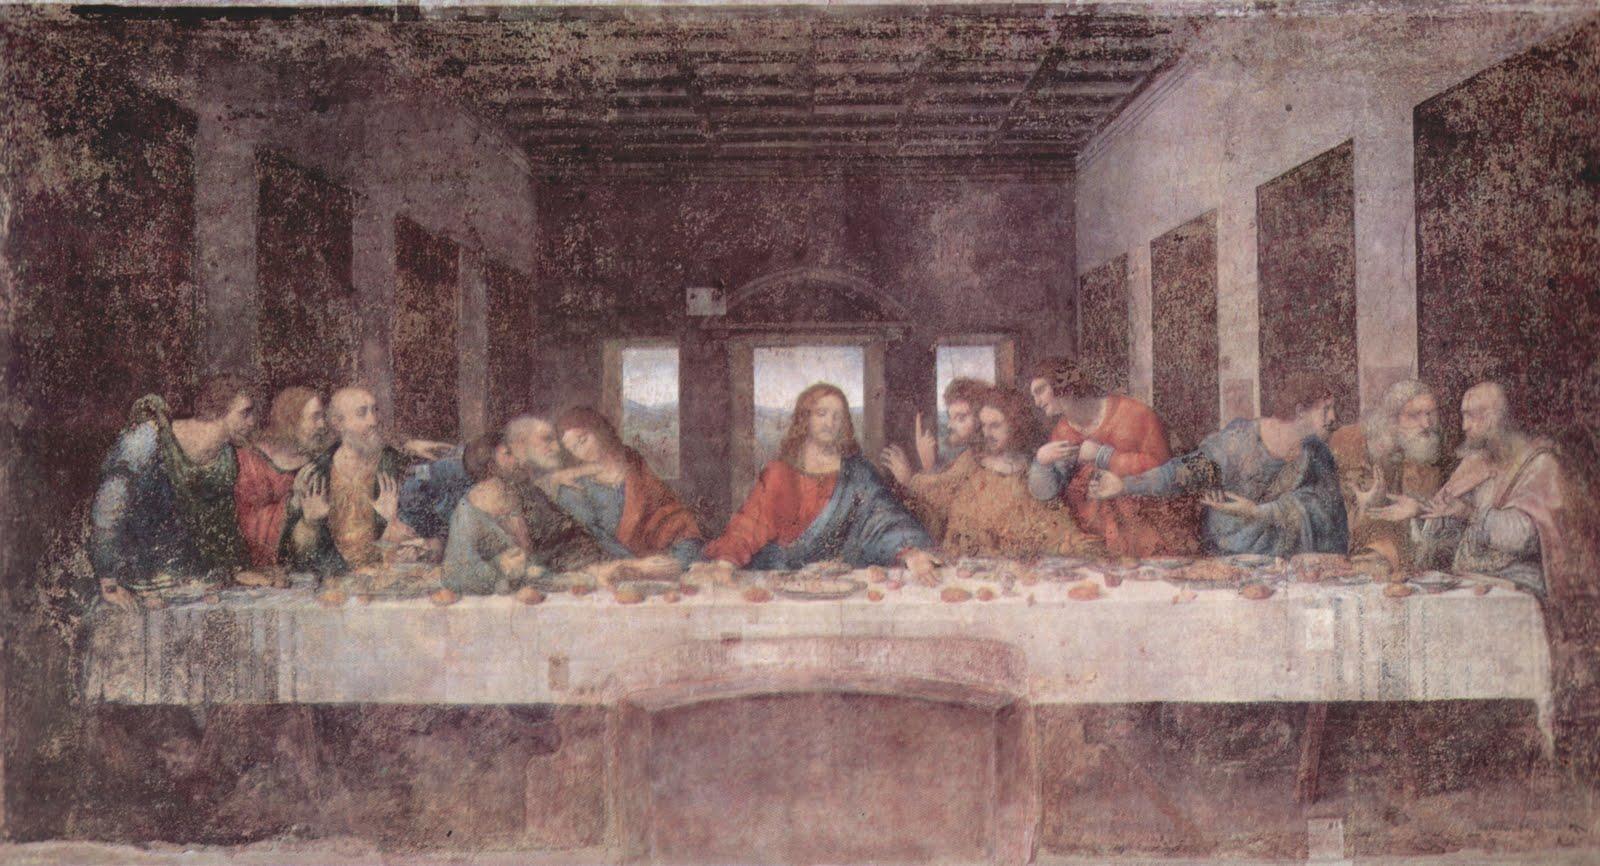 the last supper by leonardo da vinci 2 essay Papers the da vinci code and the last supper leonardo dad vinci not only was dad vinci an influential painter, he was also an engineer, sculptor.